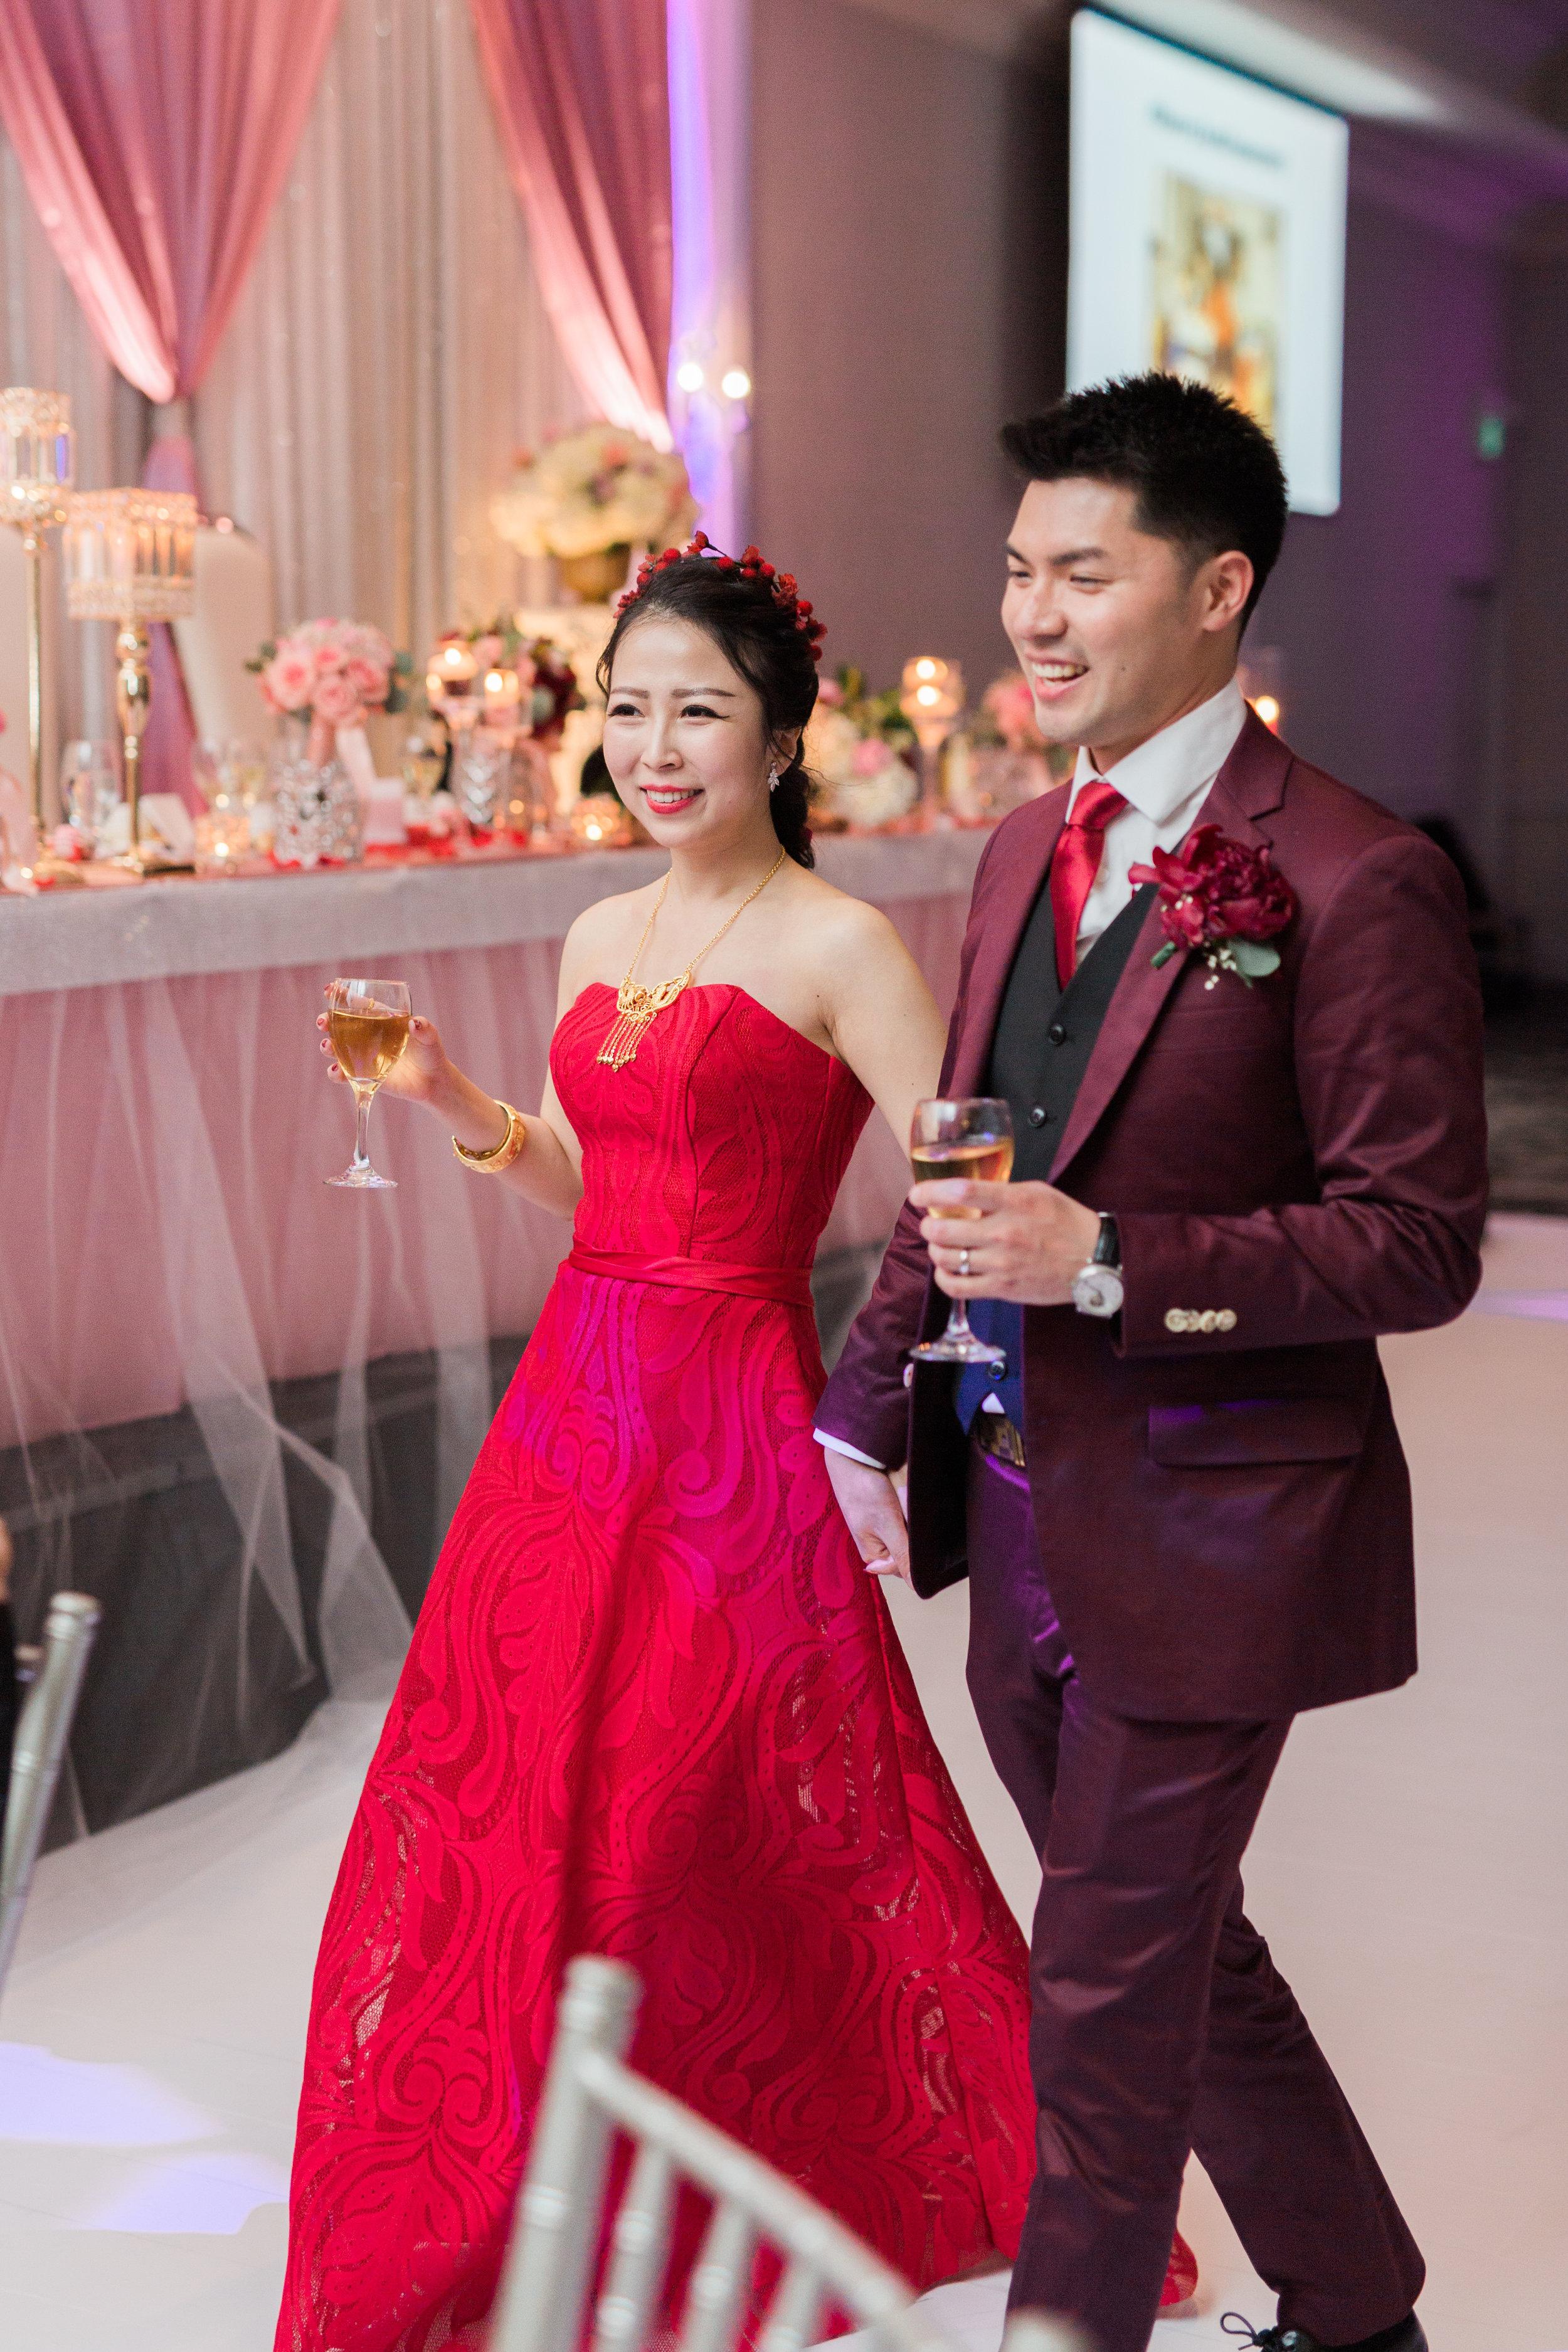 Parkview Manor Wedding - Reception-192.jpg